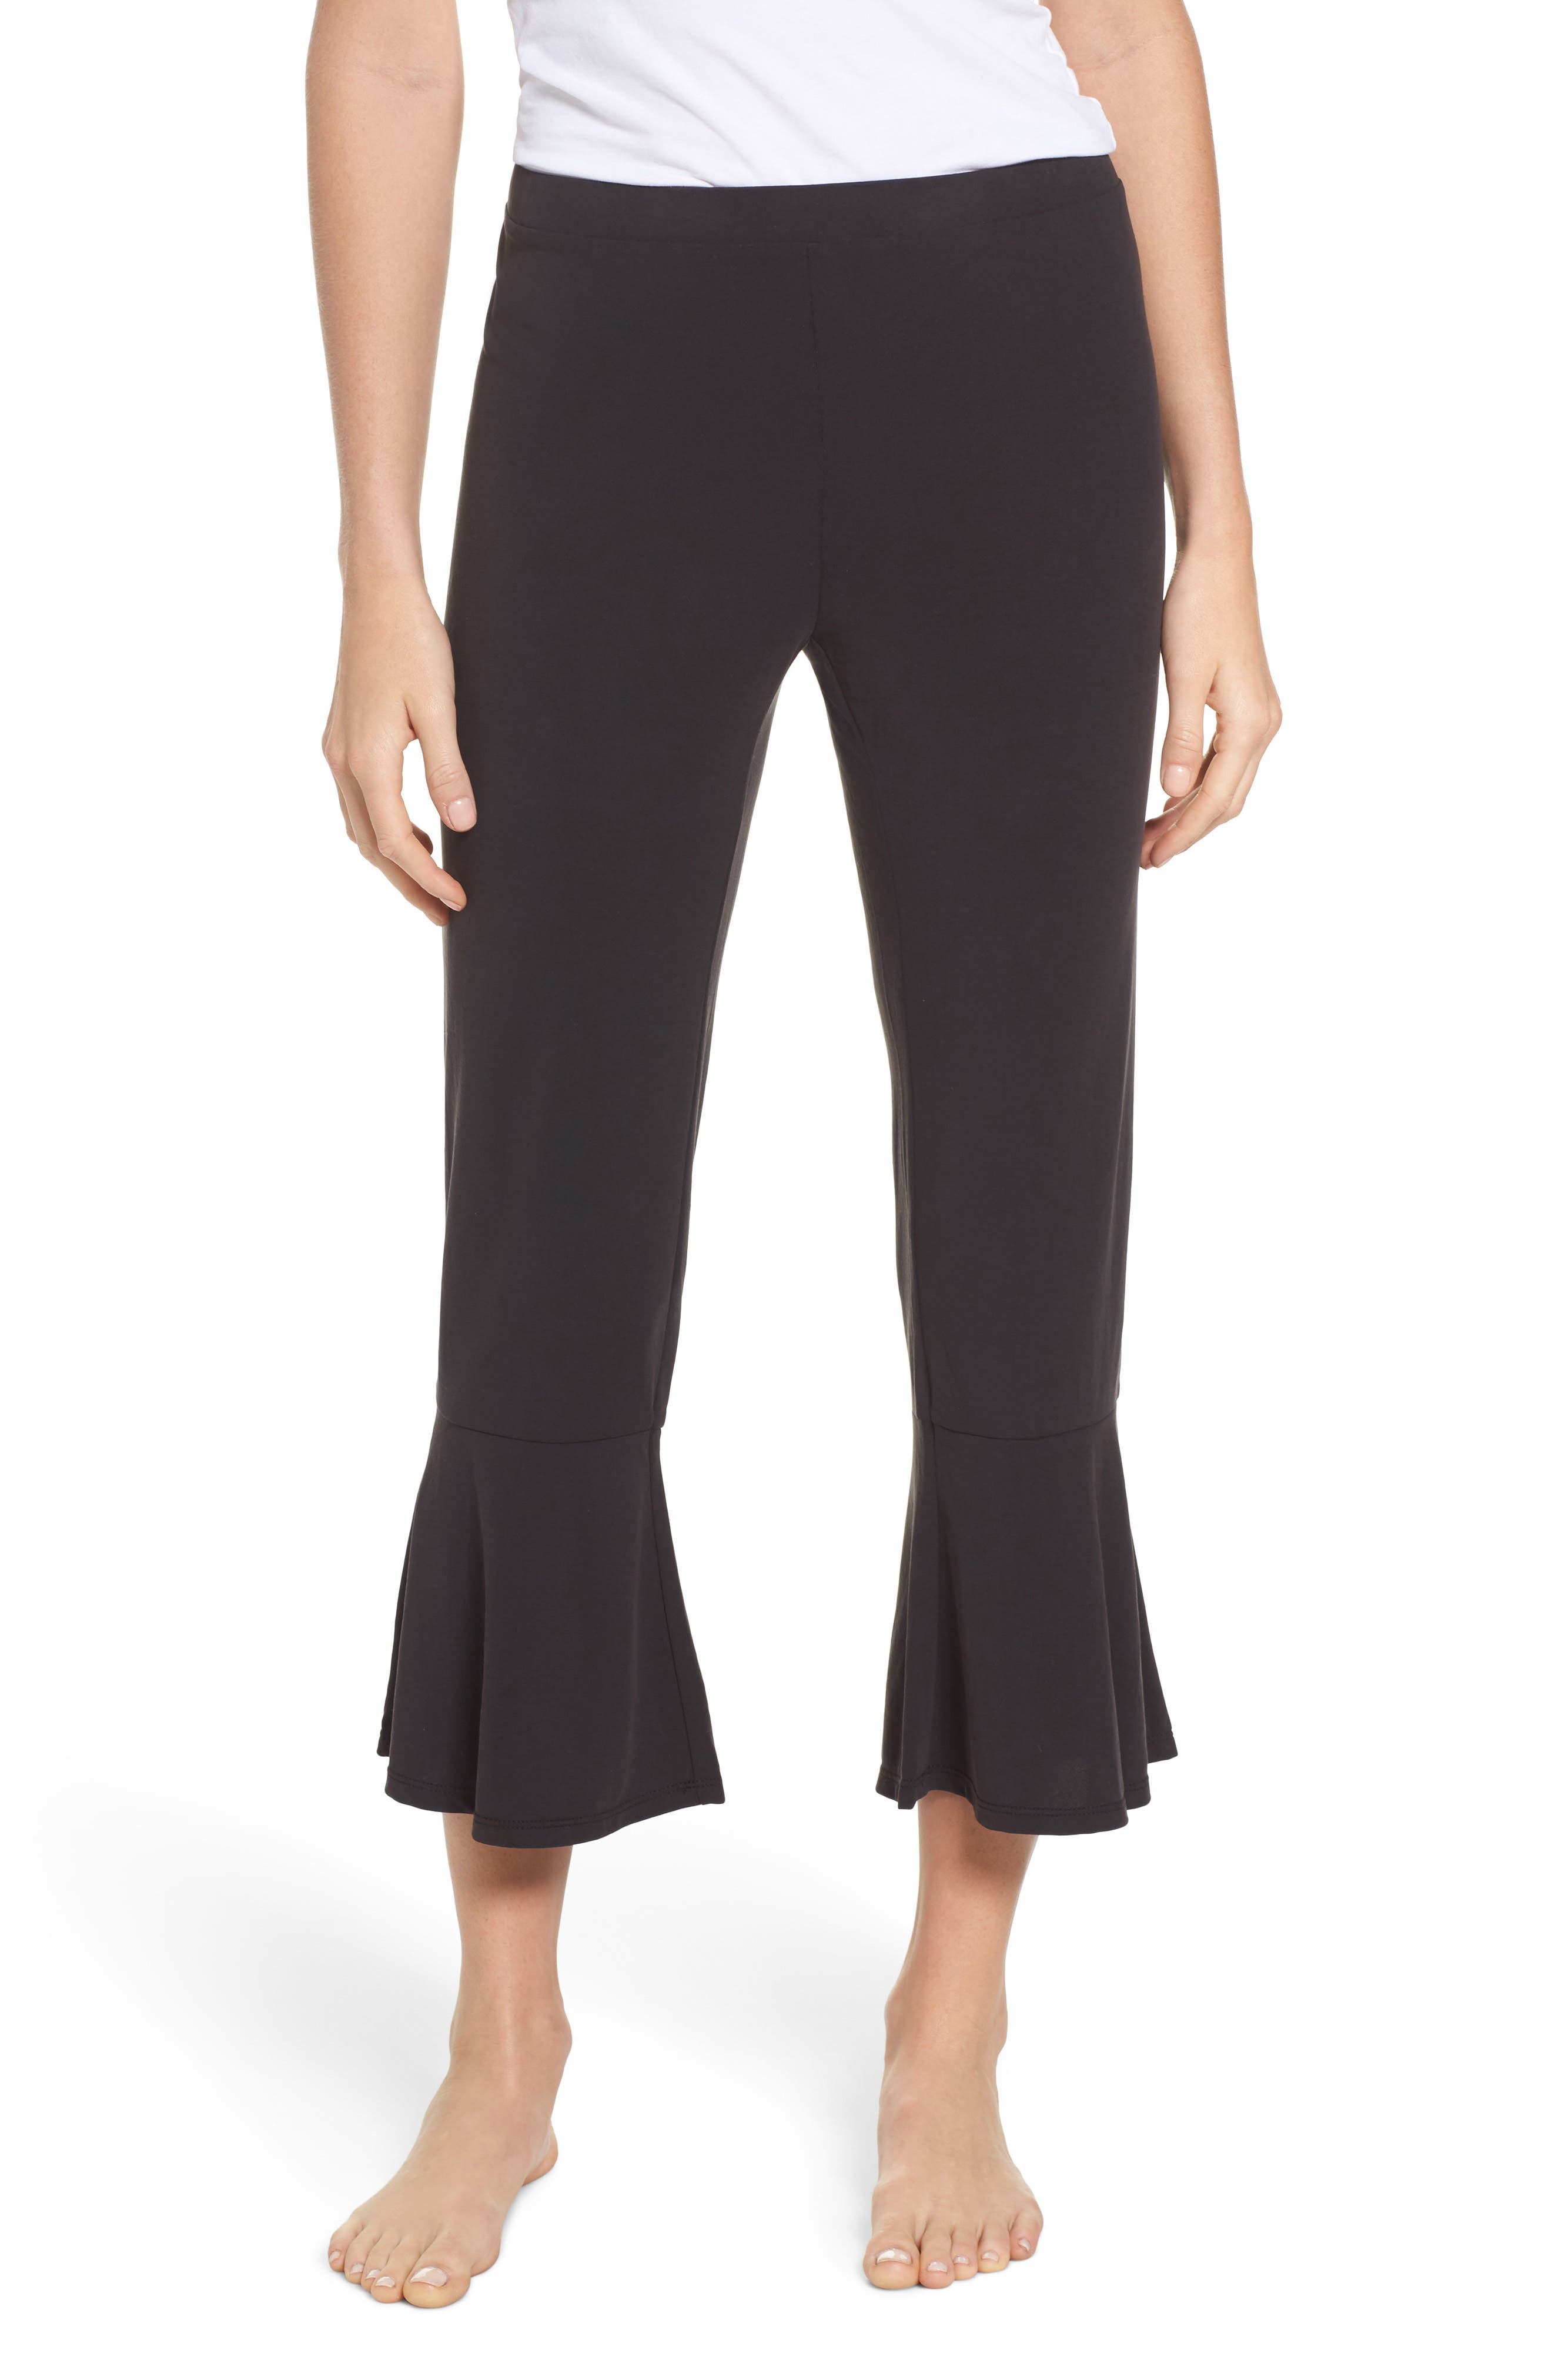 Aden Ruffle Hem Lounge Pants,                         Main,                         color, BLACK